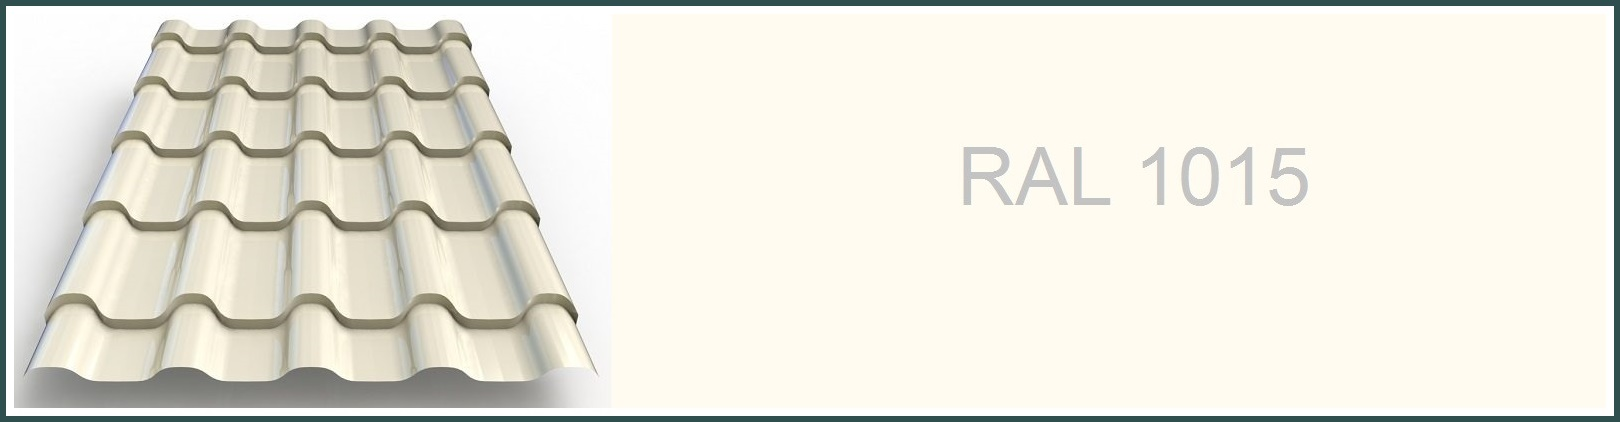 Металлочерепица 1015 Ral Цвет беж - Завод Модуль